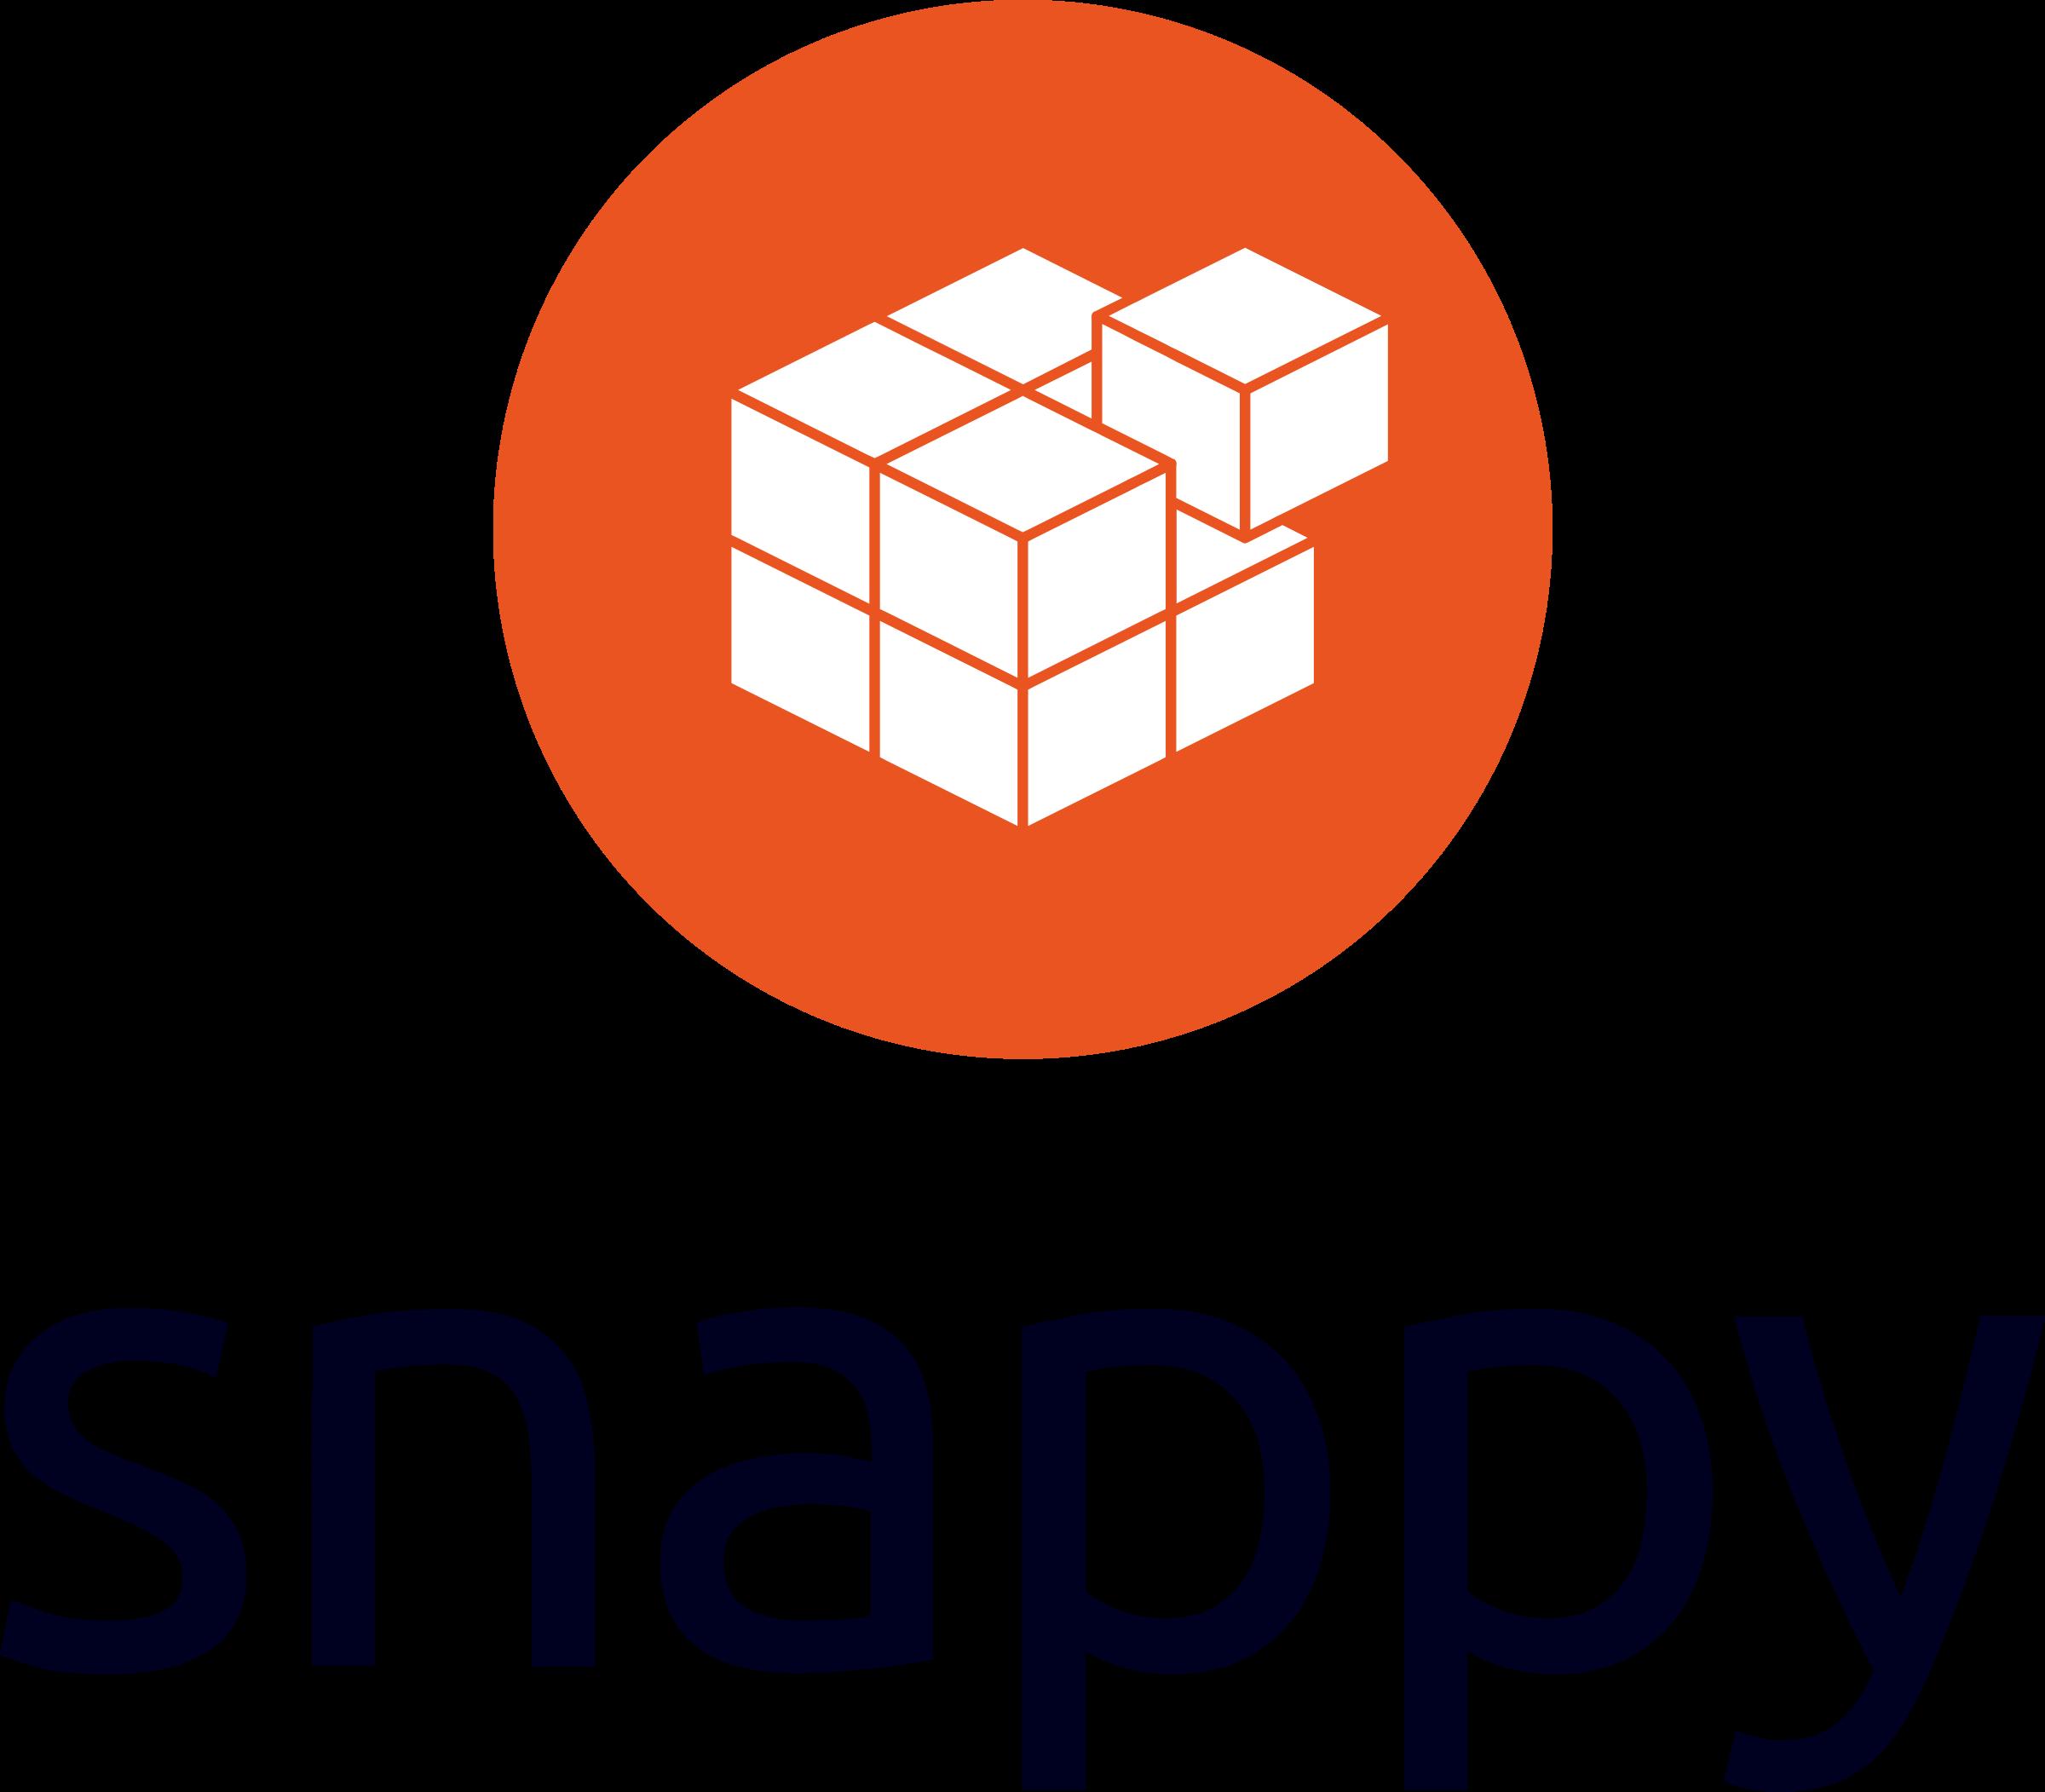 Instalando e utilizando o SNAP no Ubuntu 18.04